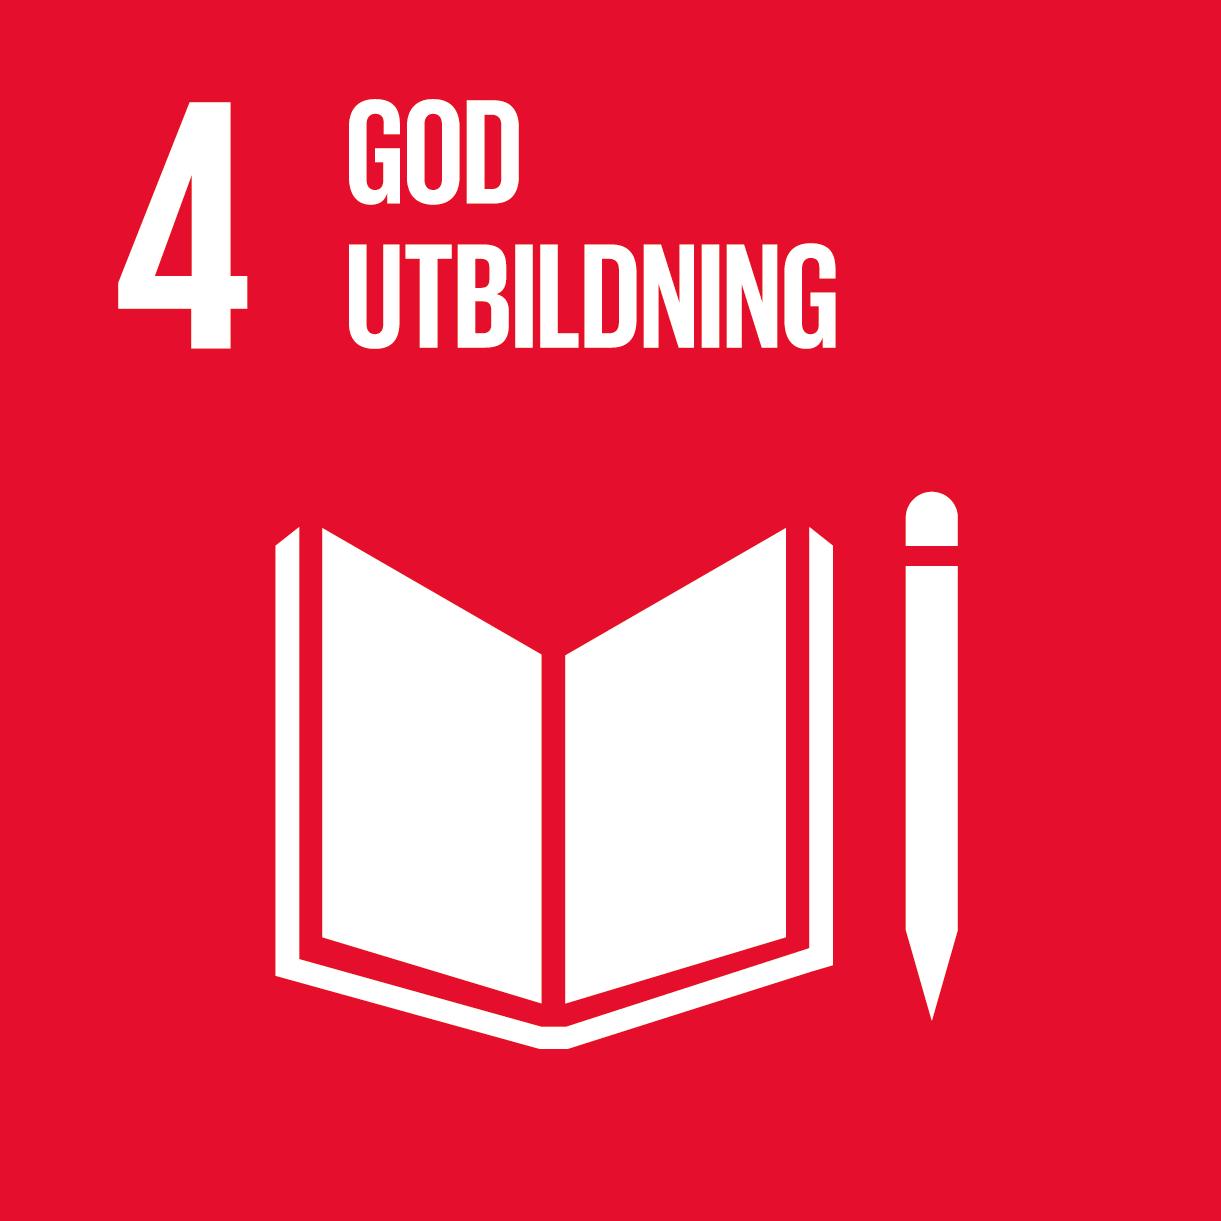 Globala mål 4, god utbildning